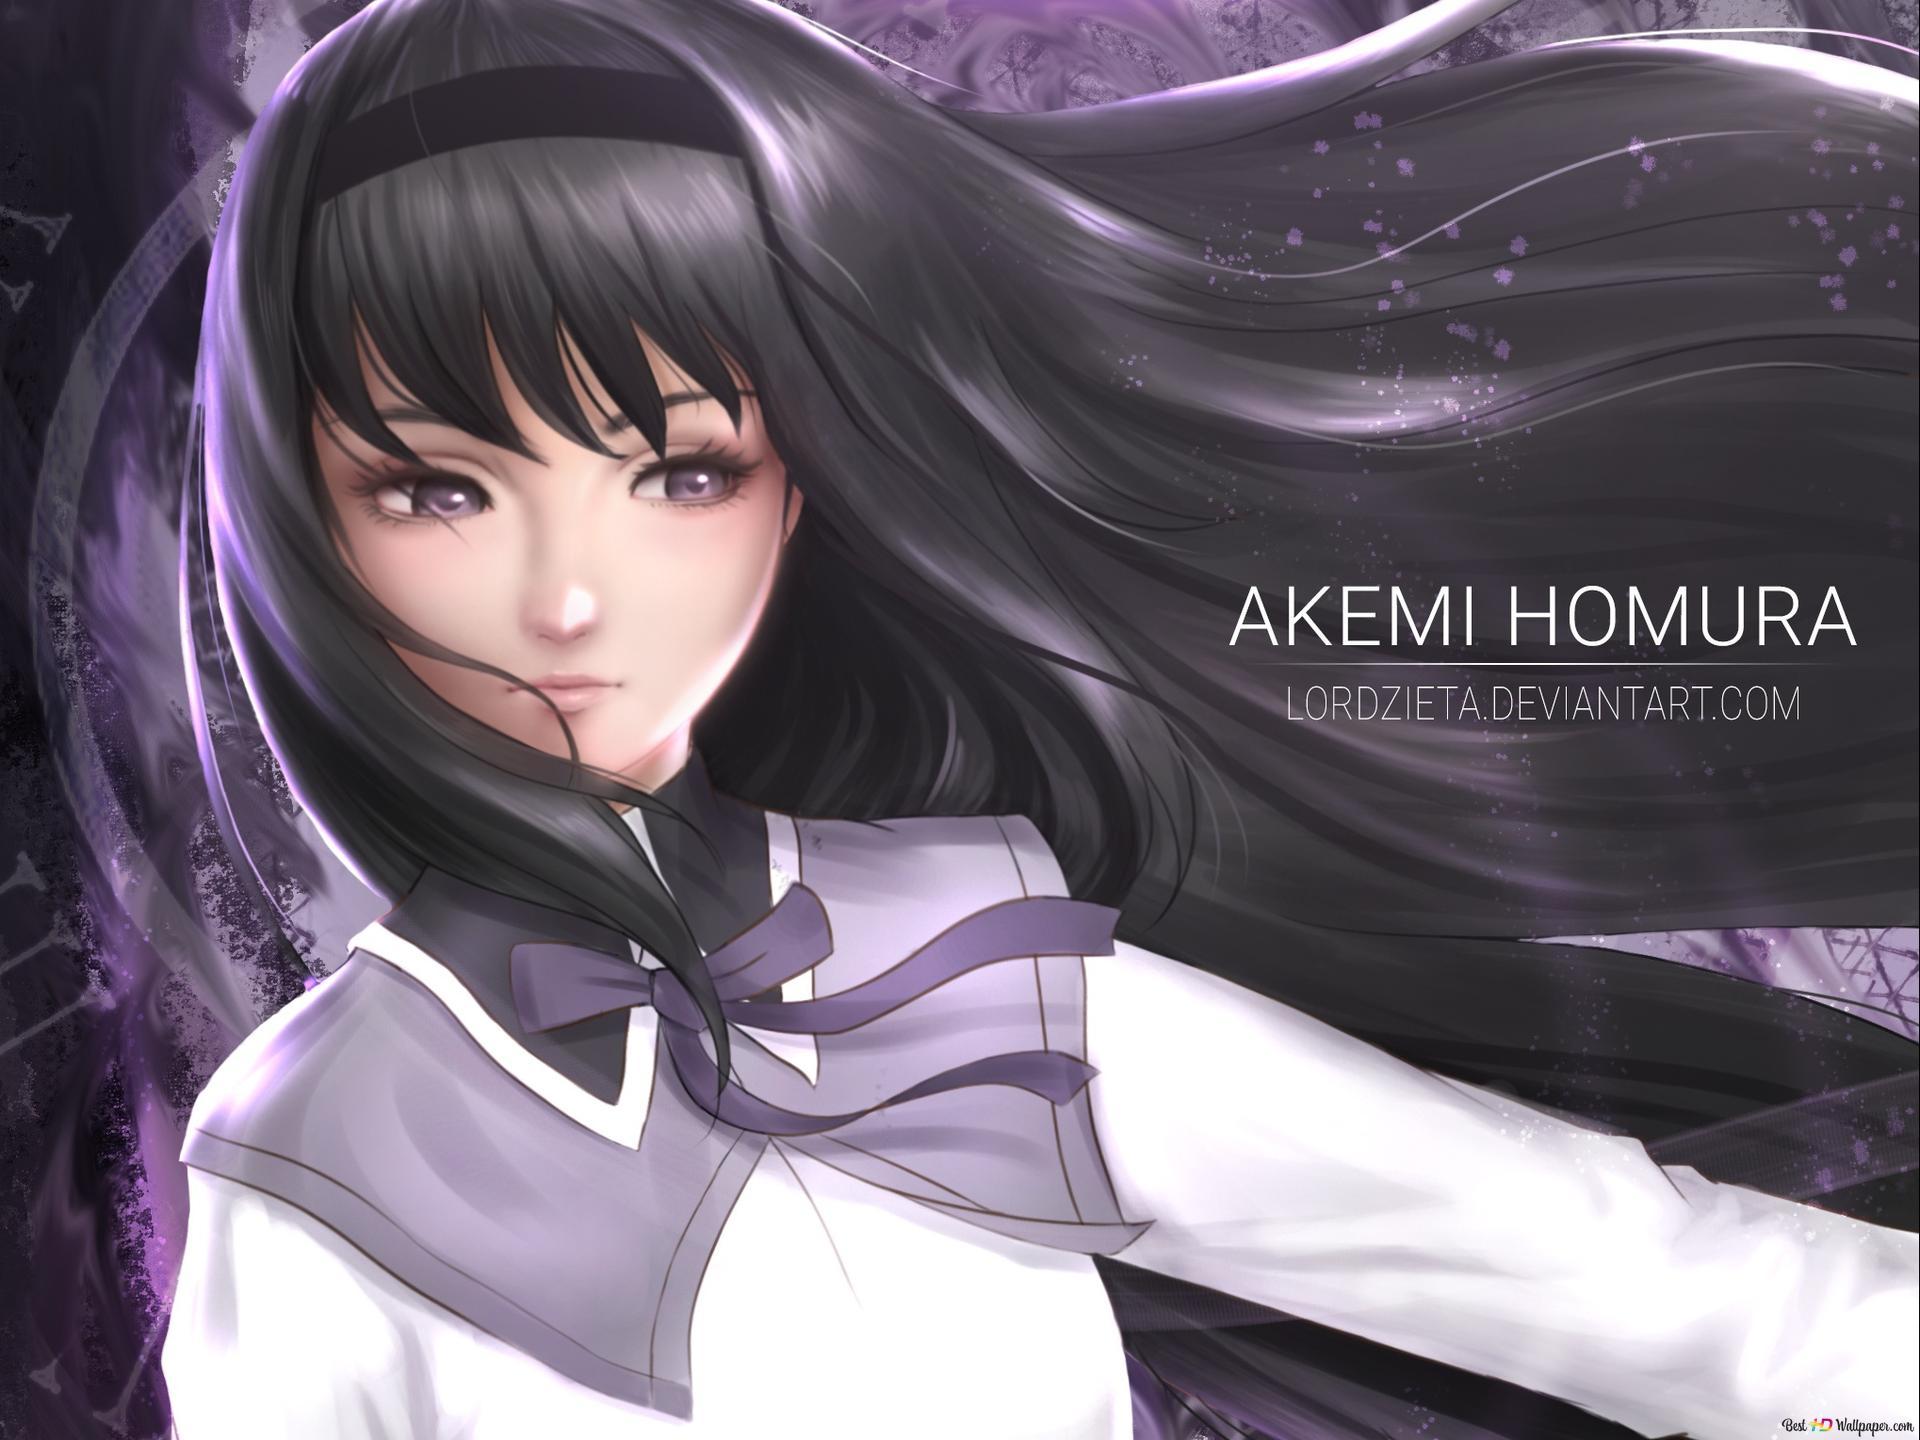 Mahou Shoujo Madoka Magica Akemi Homura Hd Wallpaper Download